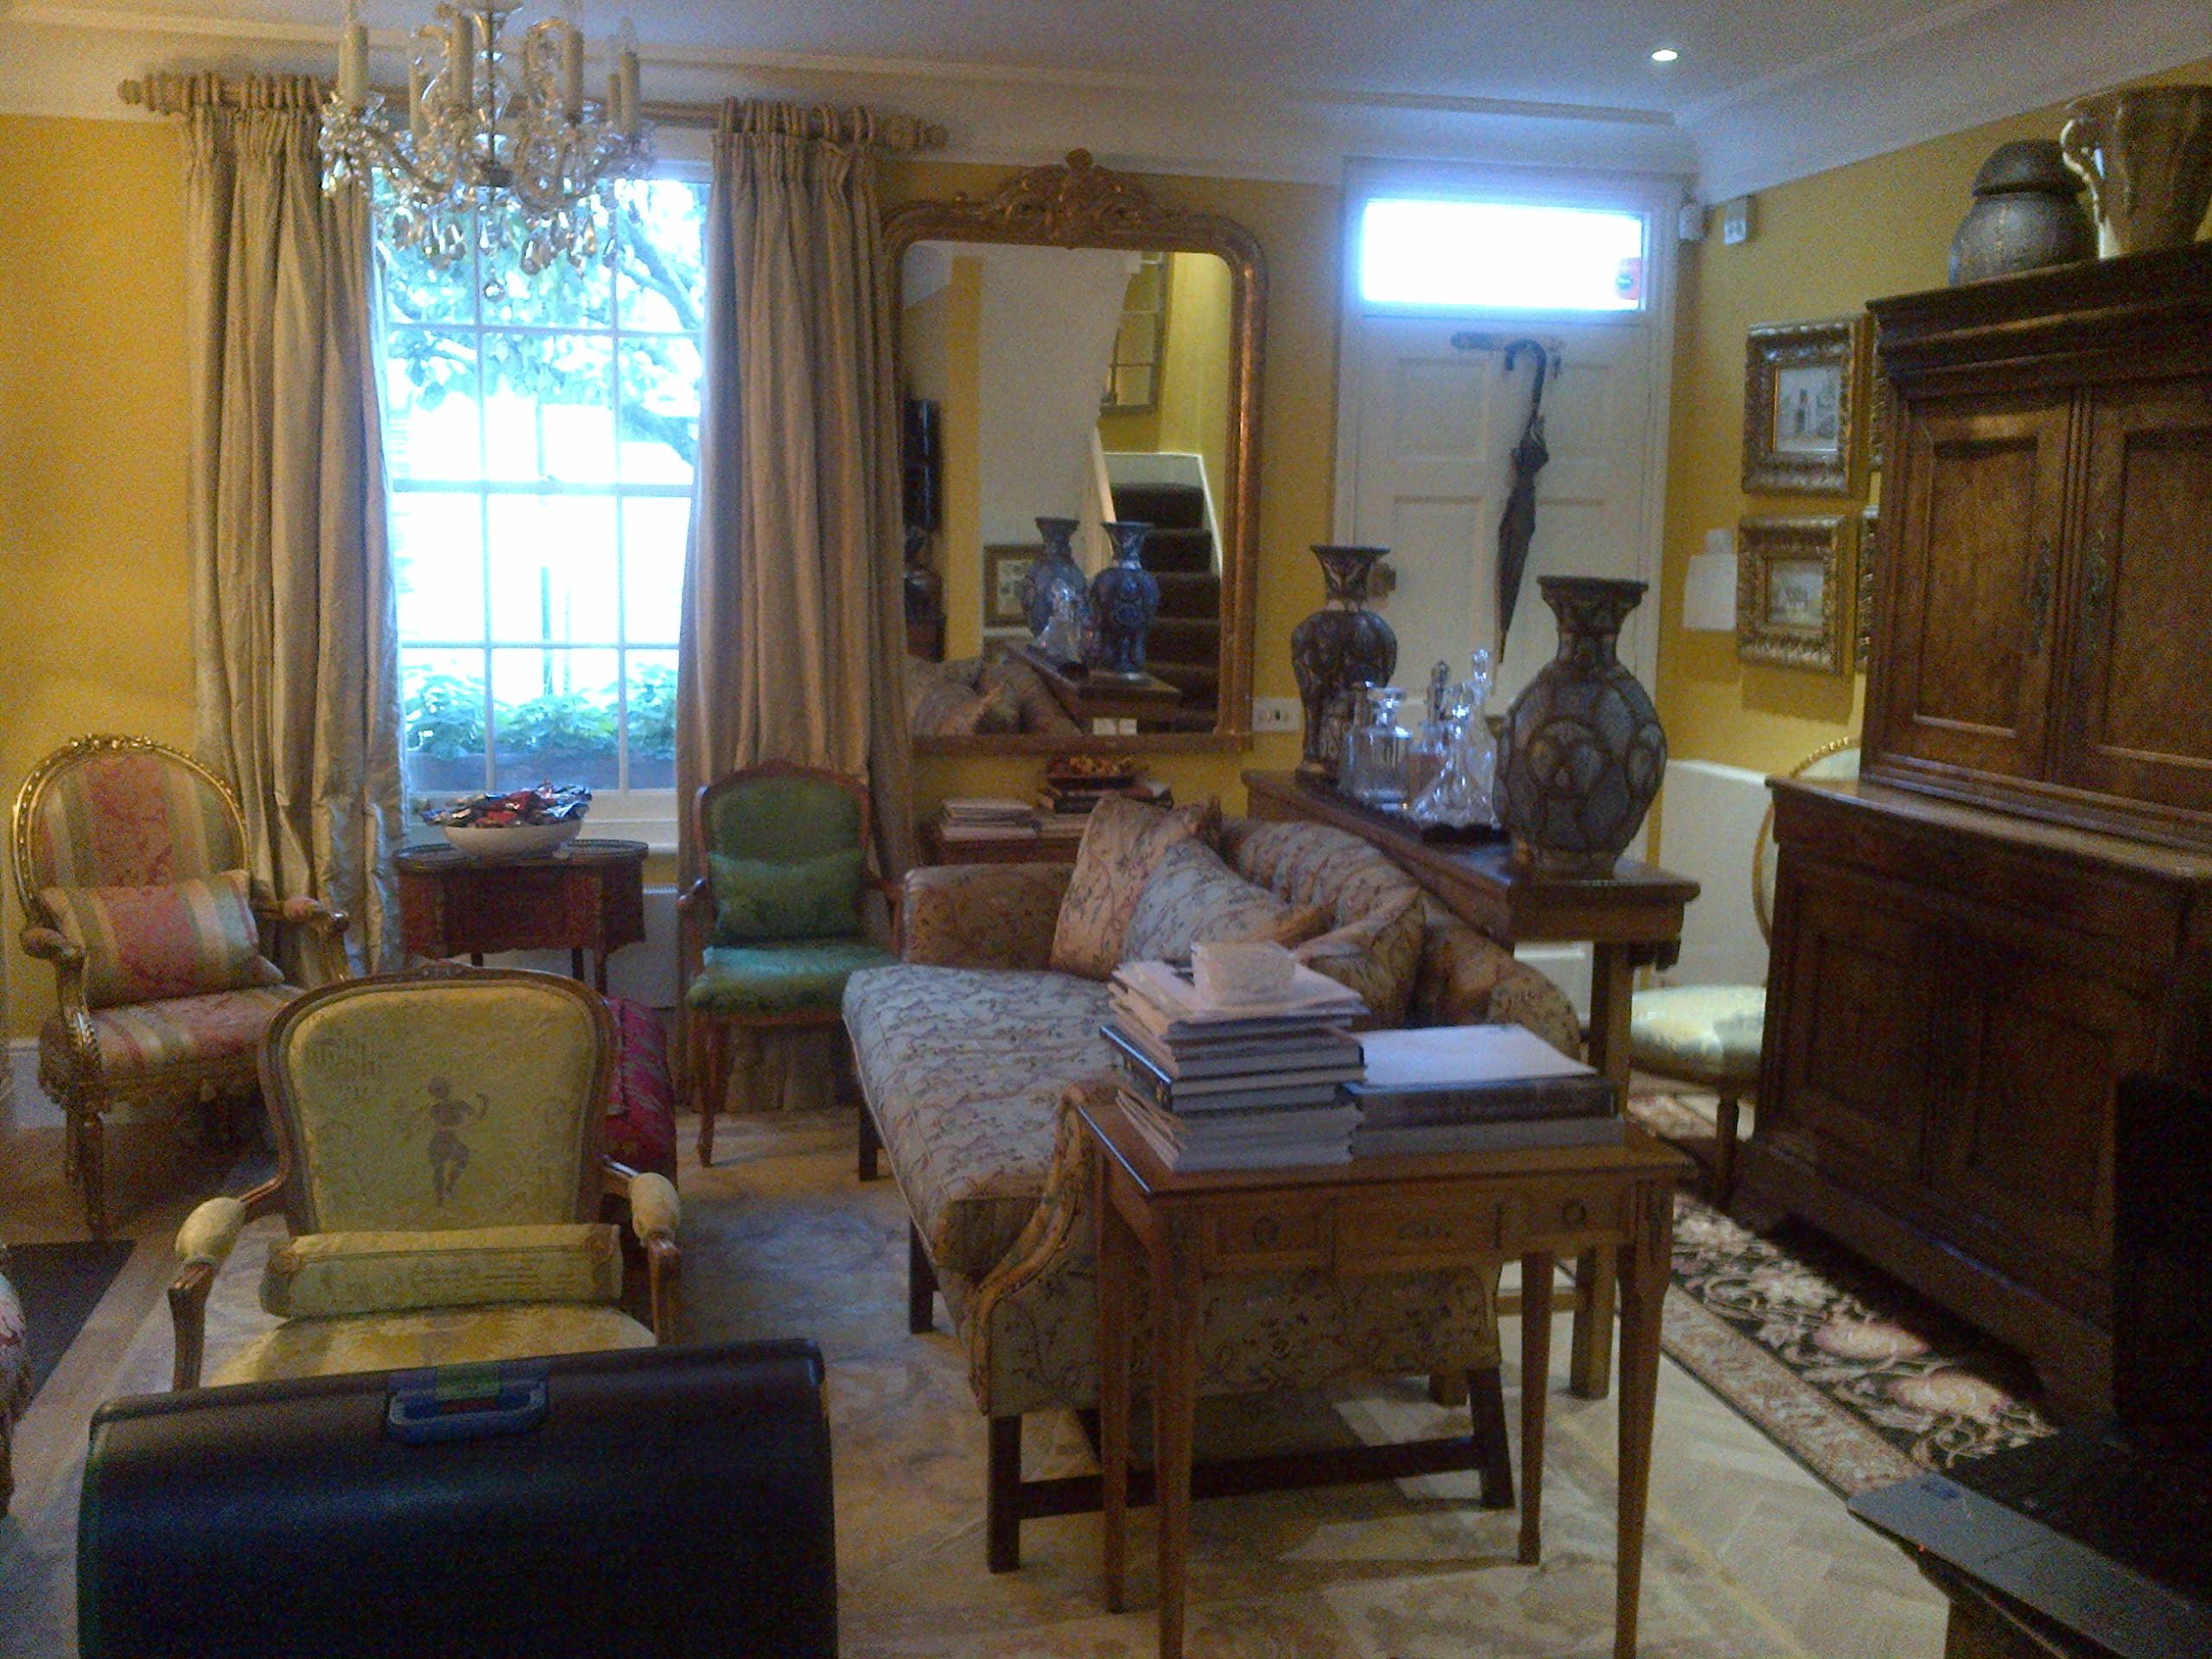 find a housekeeper course london bespoke bureau domestic staff image